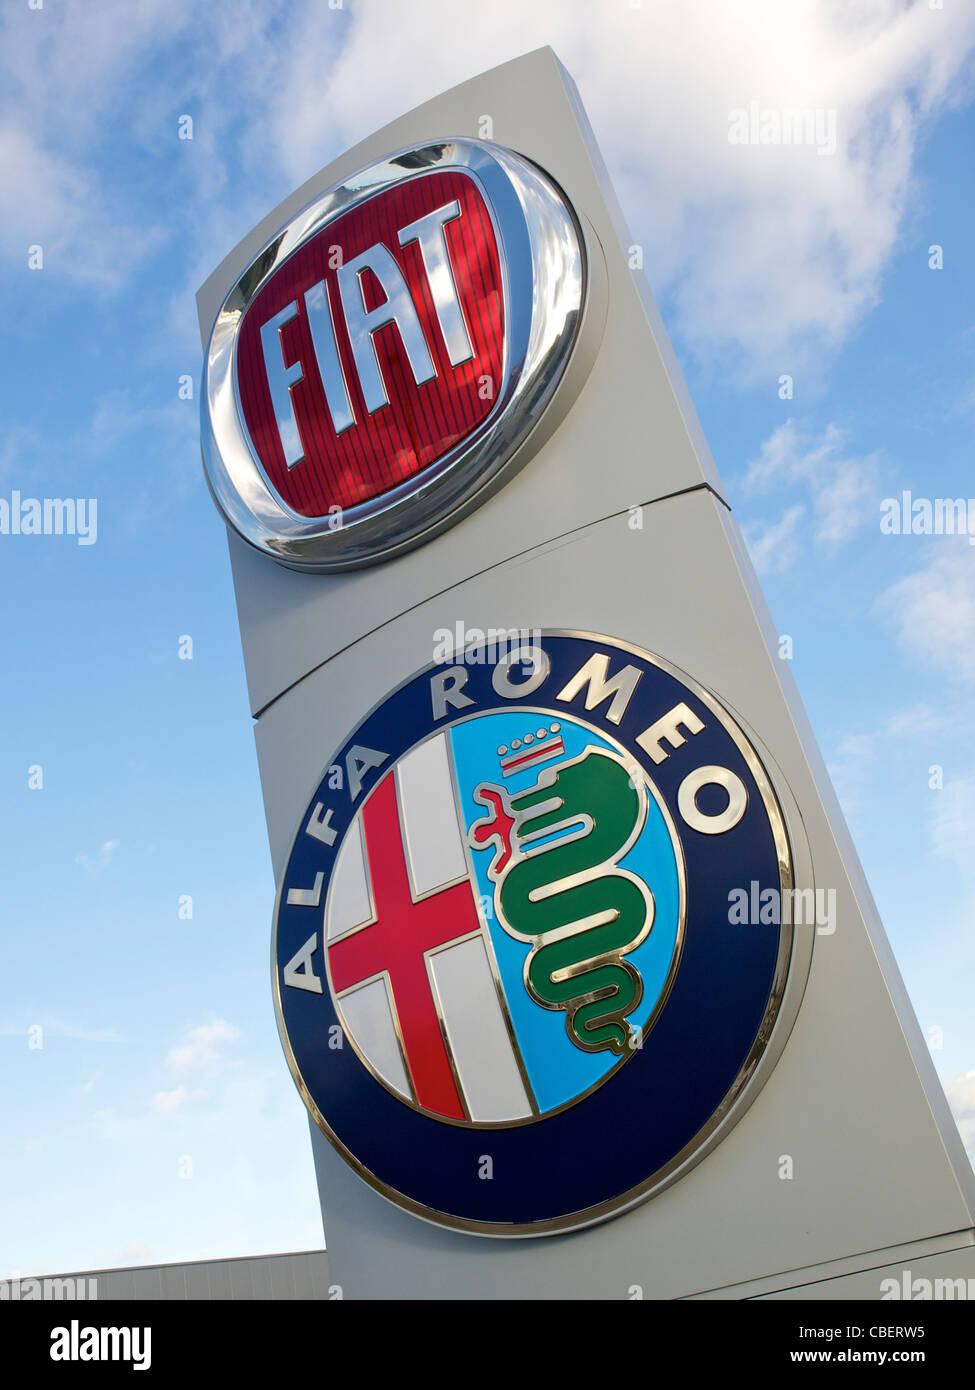 Fiat and Alfa Romeo Italian car manufacturers logo's - Stock Image